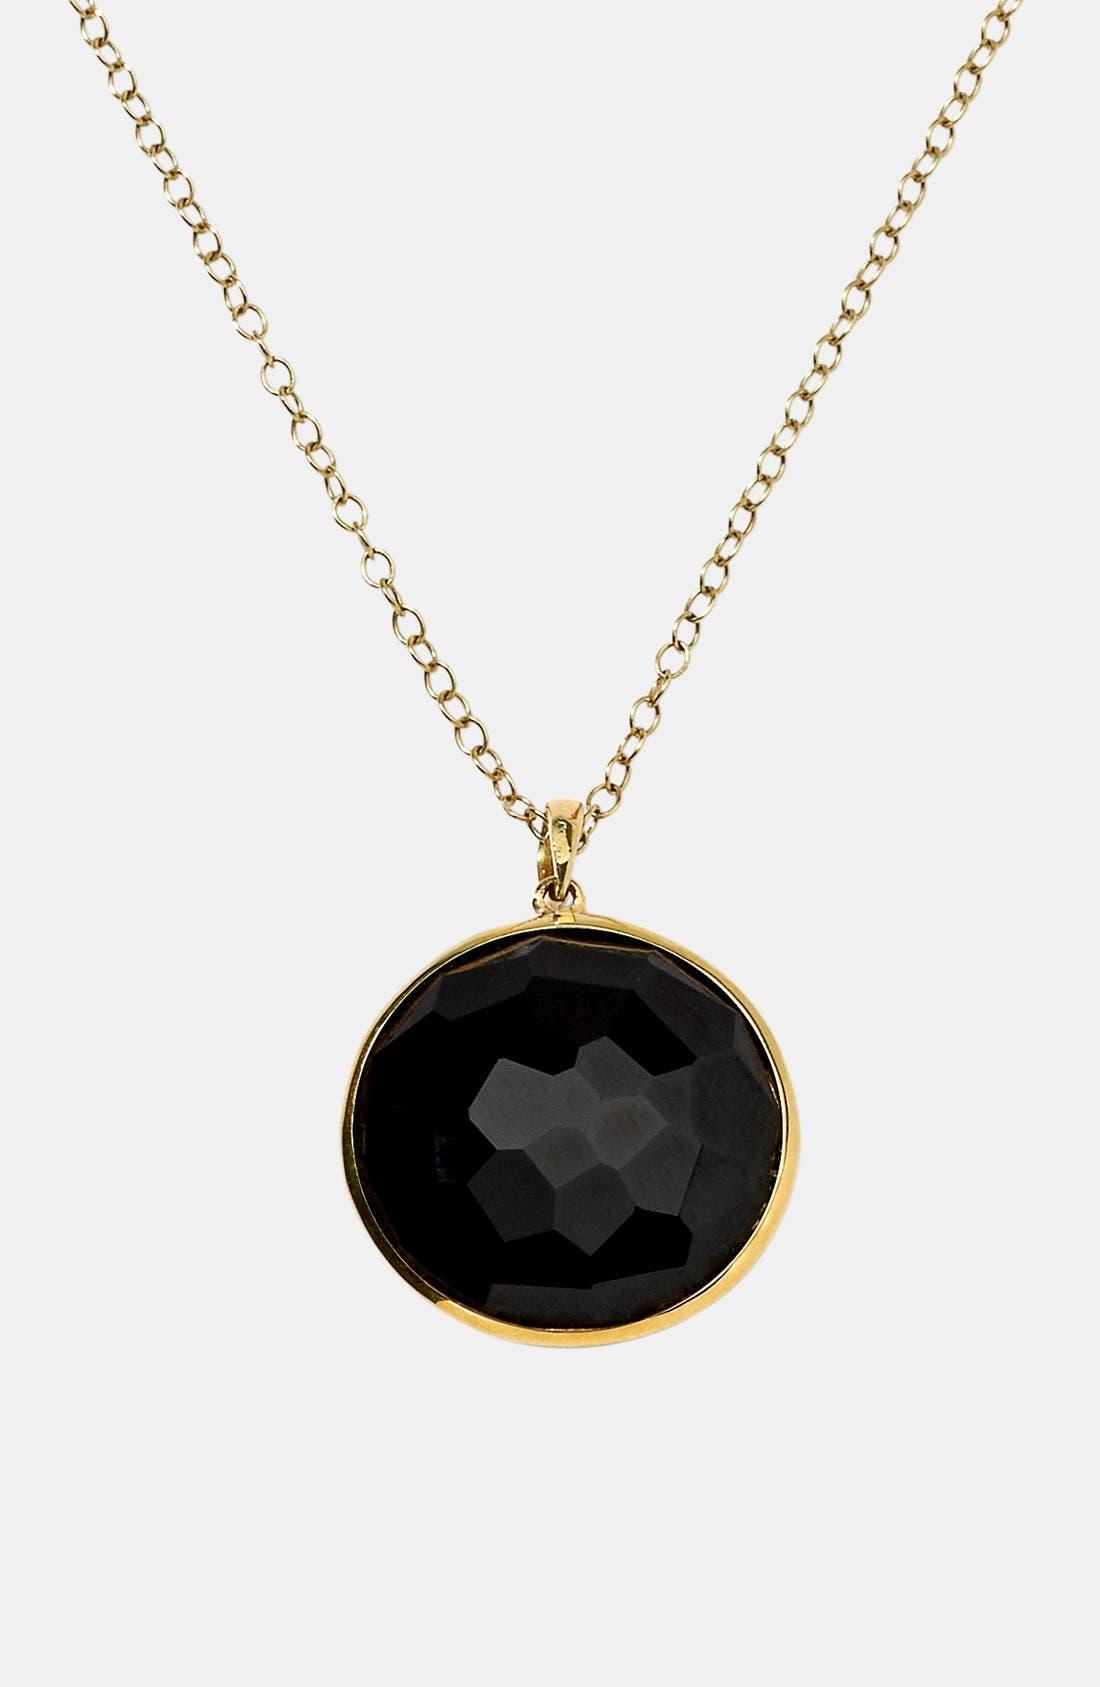 Alternate Image 1 Selected - Ippolita 'Rock Candy - Lollipop' 18k Gold Pendant Necklace